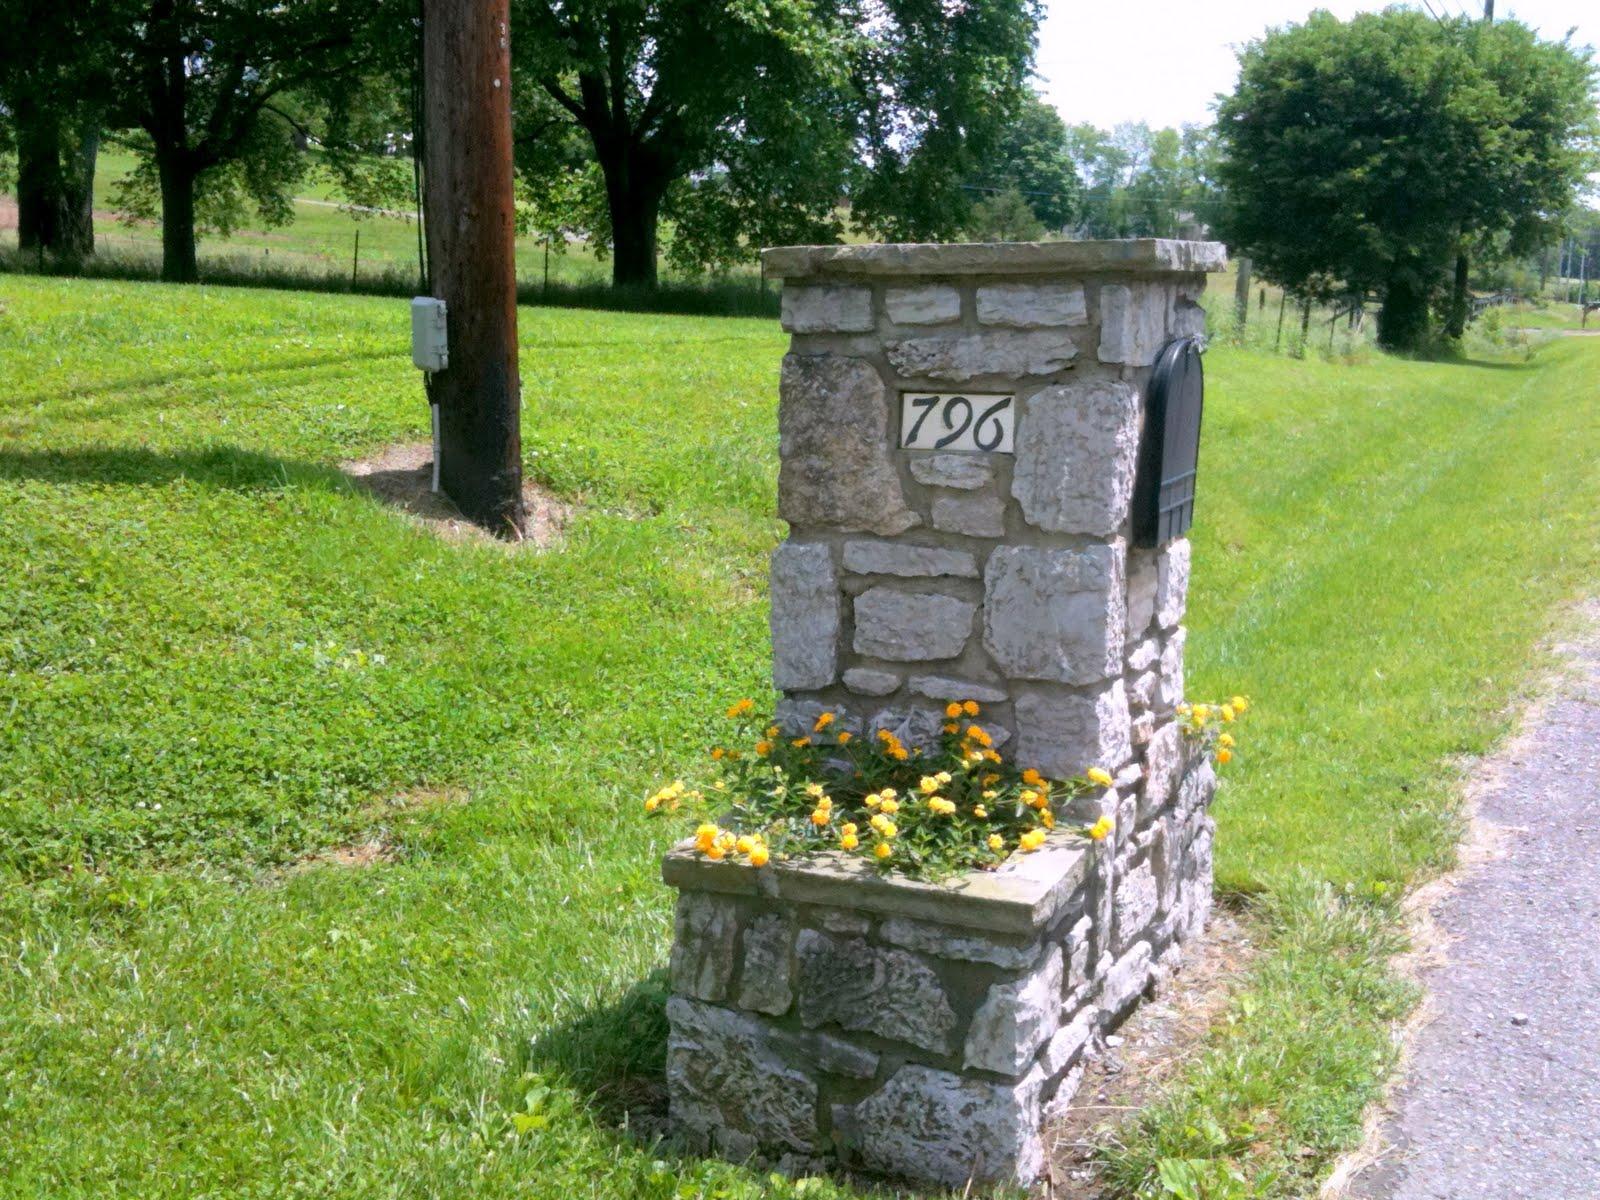 awesome mailbox ideas brick mailboxes design decorative mailboxes with mailbox planter ideas - Mailbox Design Ideas